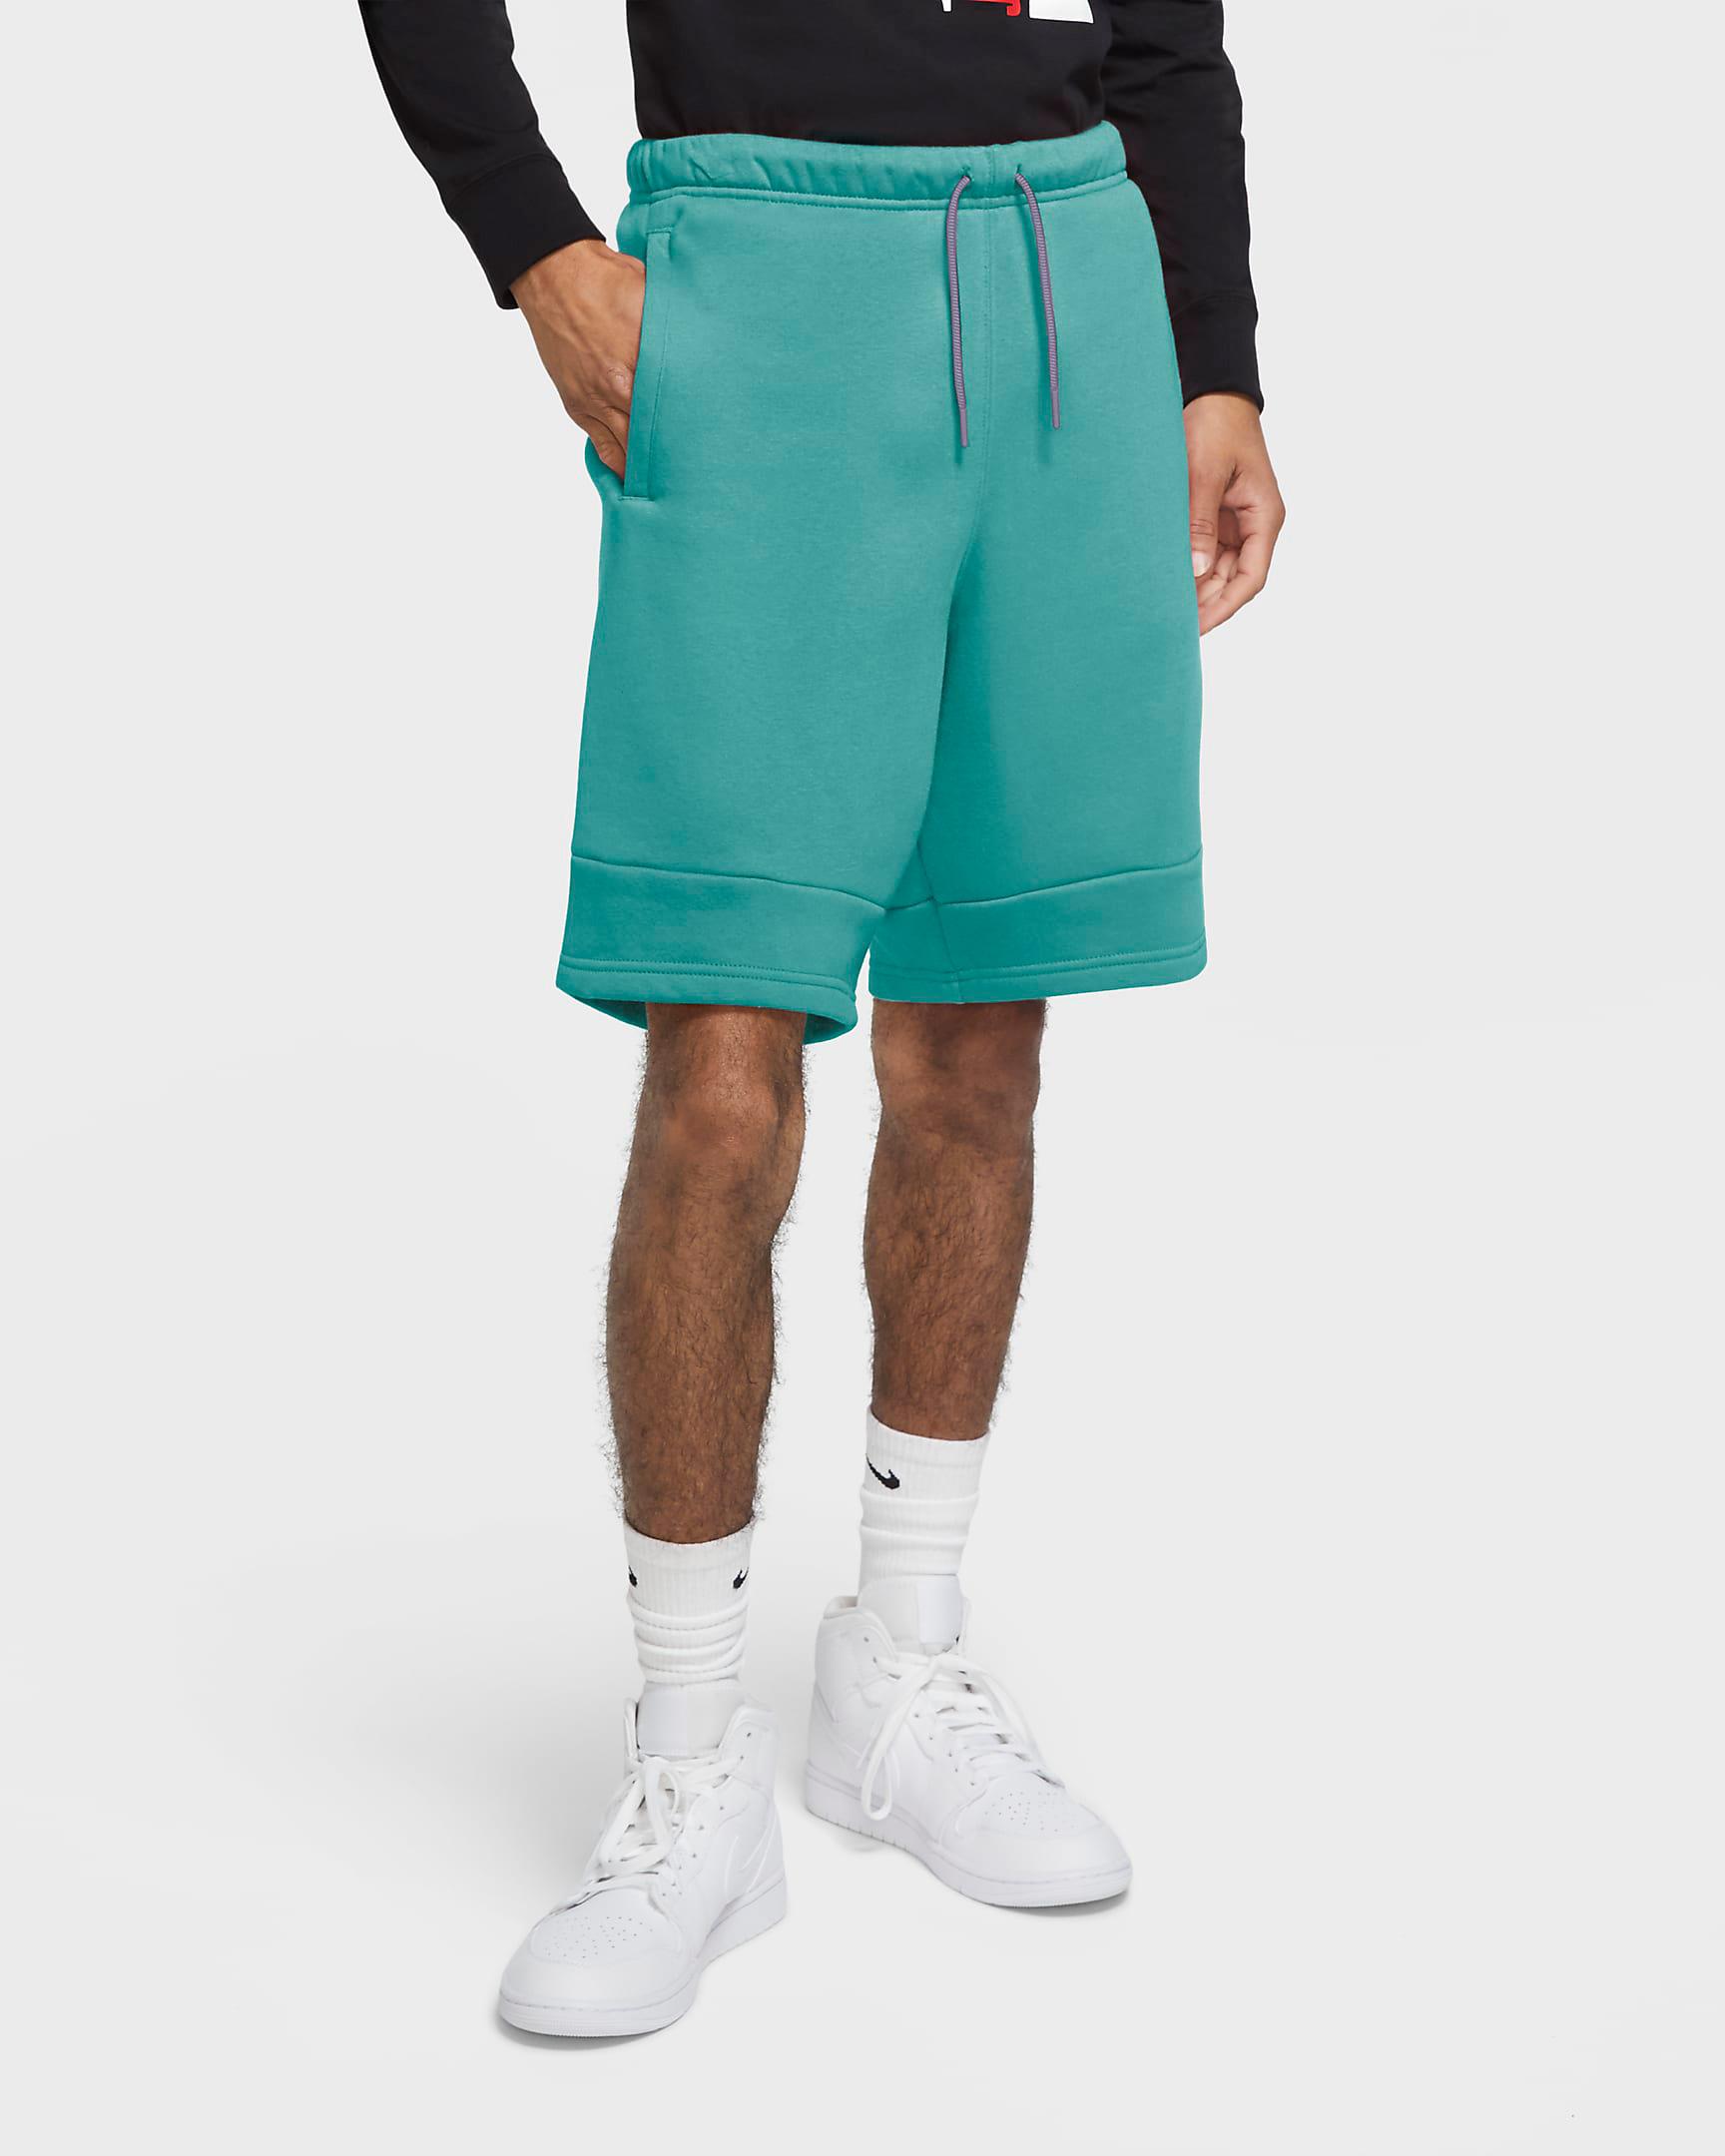 jordan-tropical-twist-jumpman-air-fleece-shorts-1